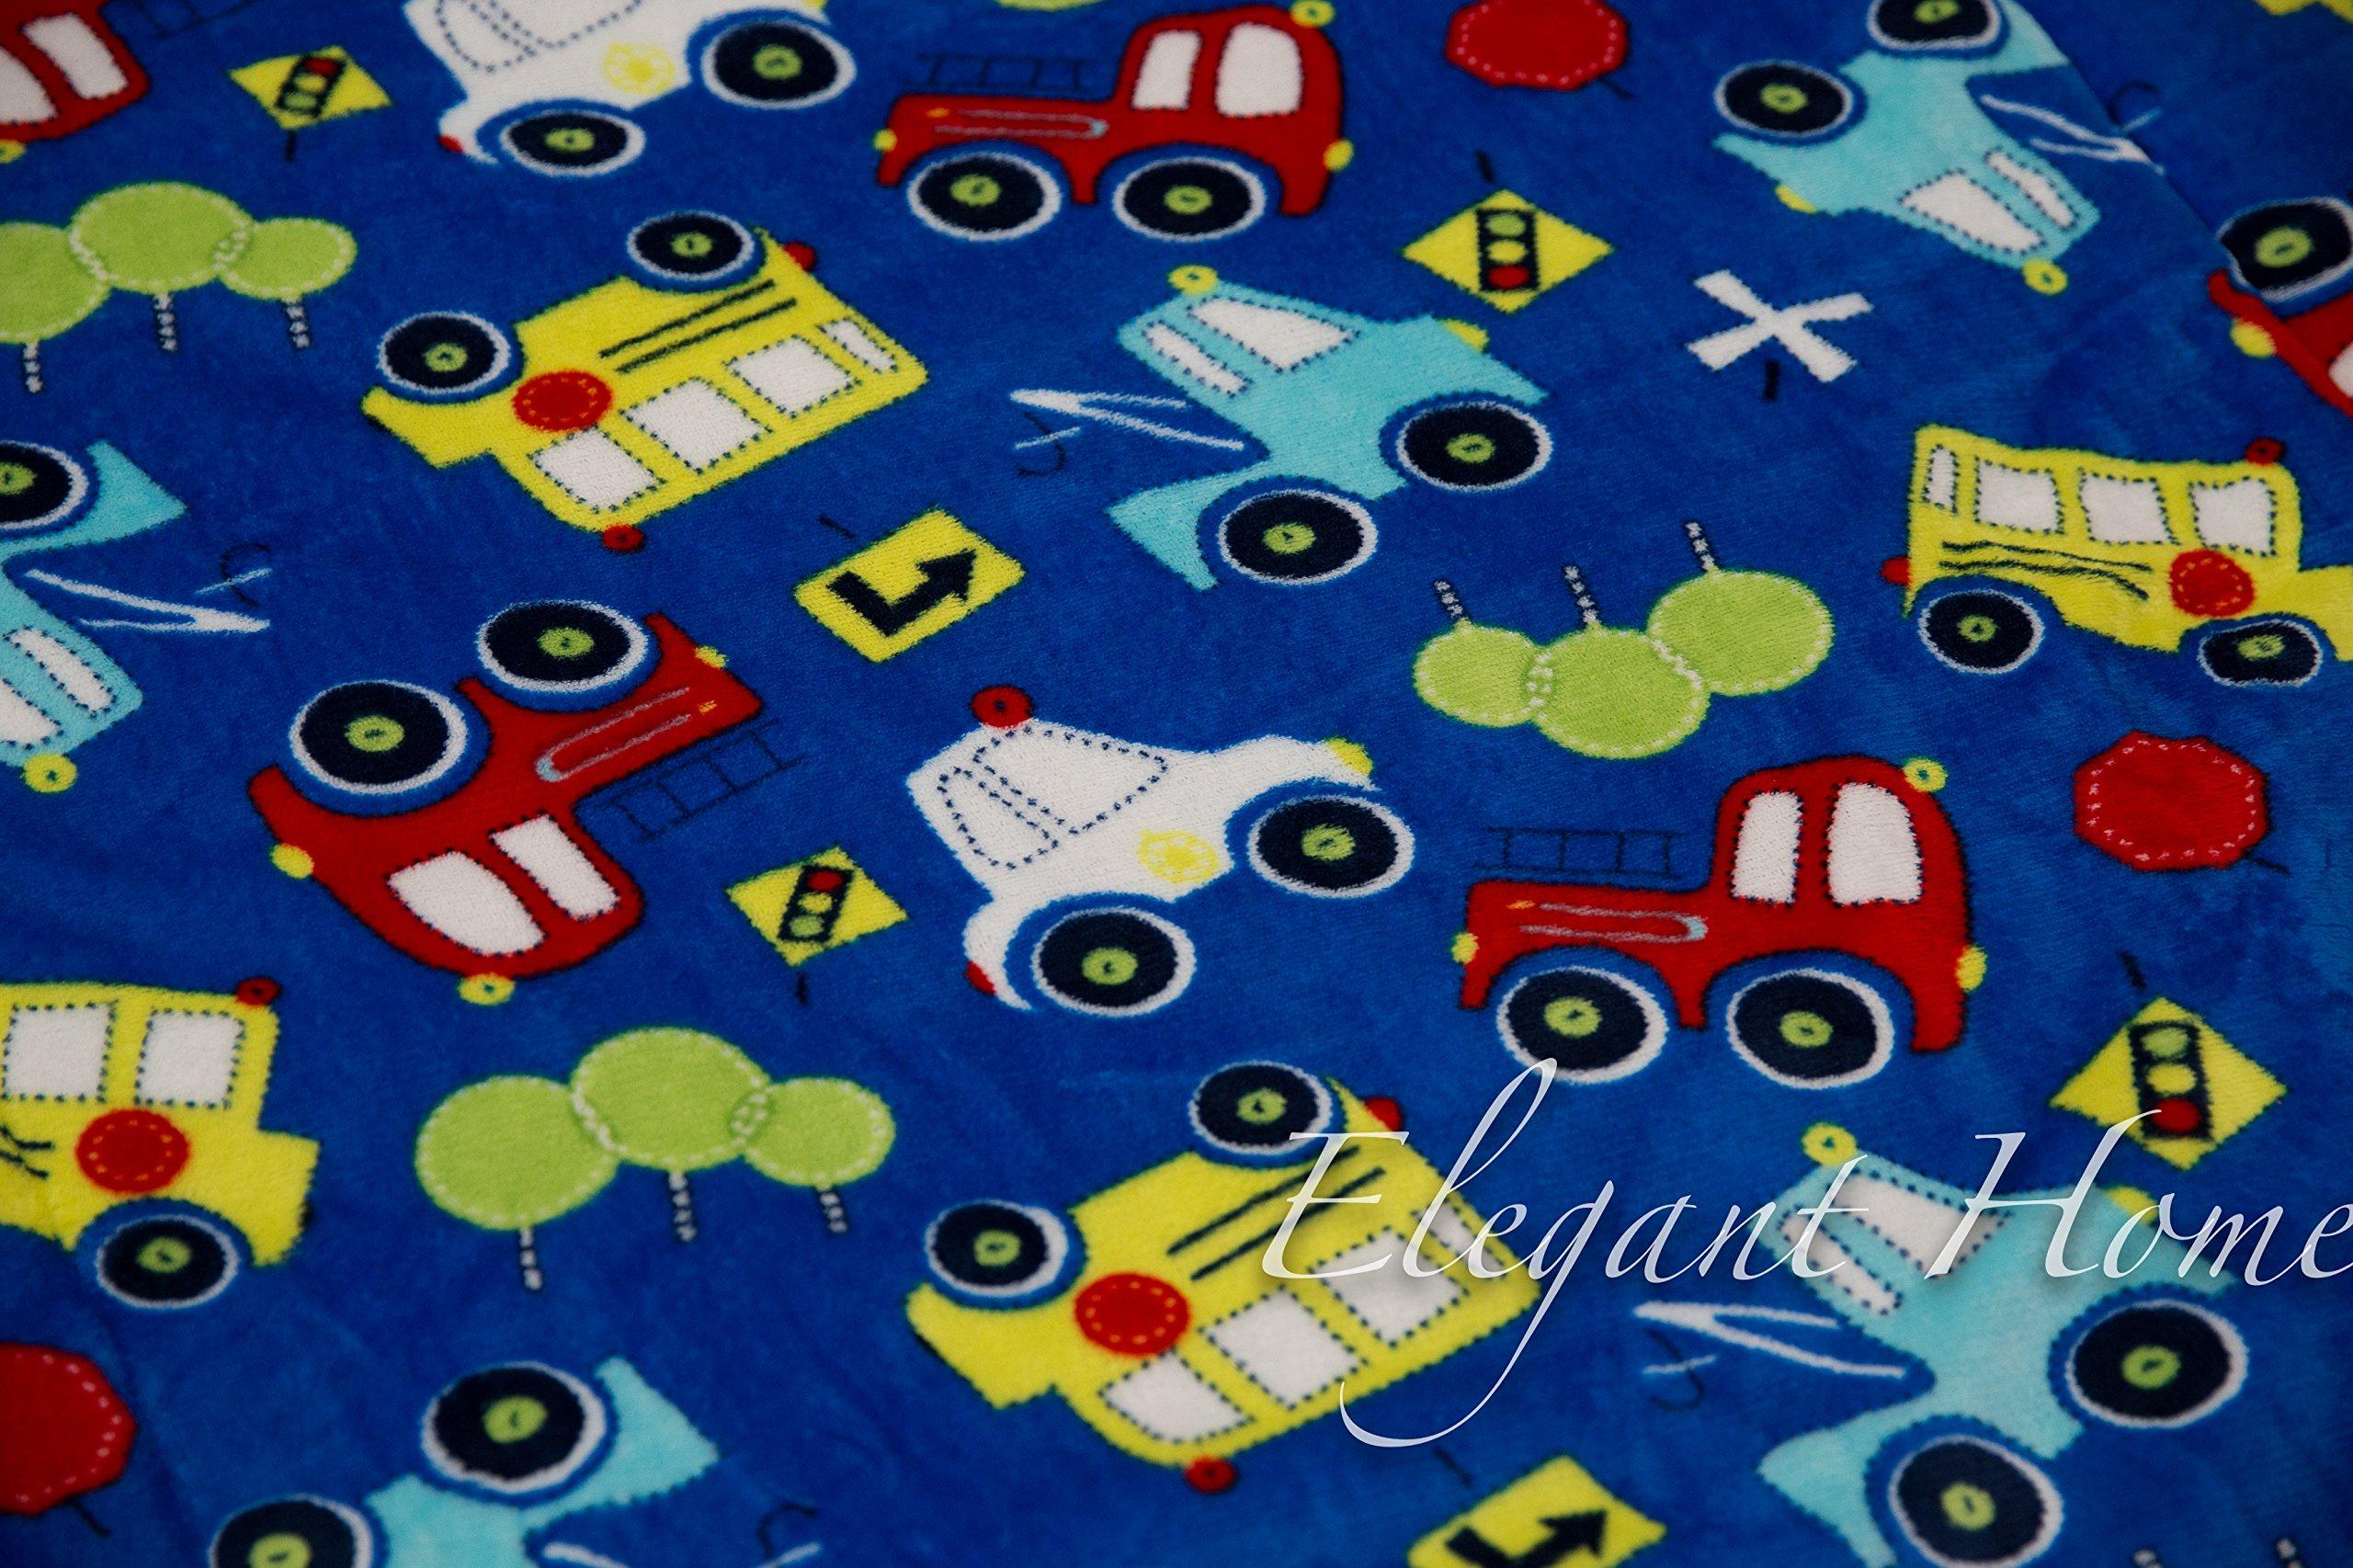 Elegant Home Kids Soft & Warm Sherpa Baby Toddler Boy Sherpa Blanket Multicolor Cars Trucks Buses Printed Borrego Stroller or Toddler Bed Blanket Plush Throw 40X50 # Cars by Elegant Home (Image #2)